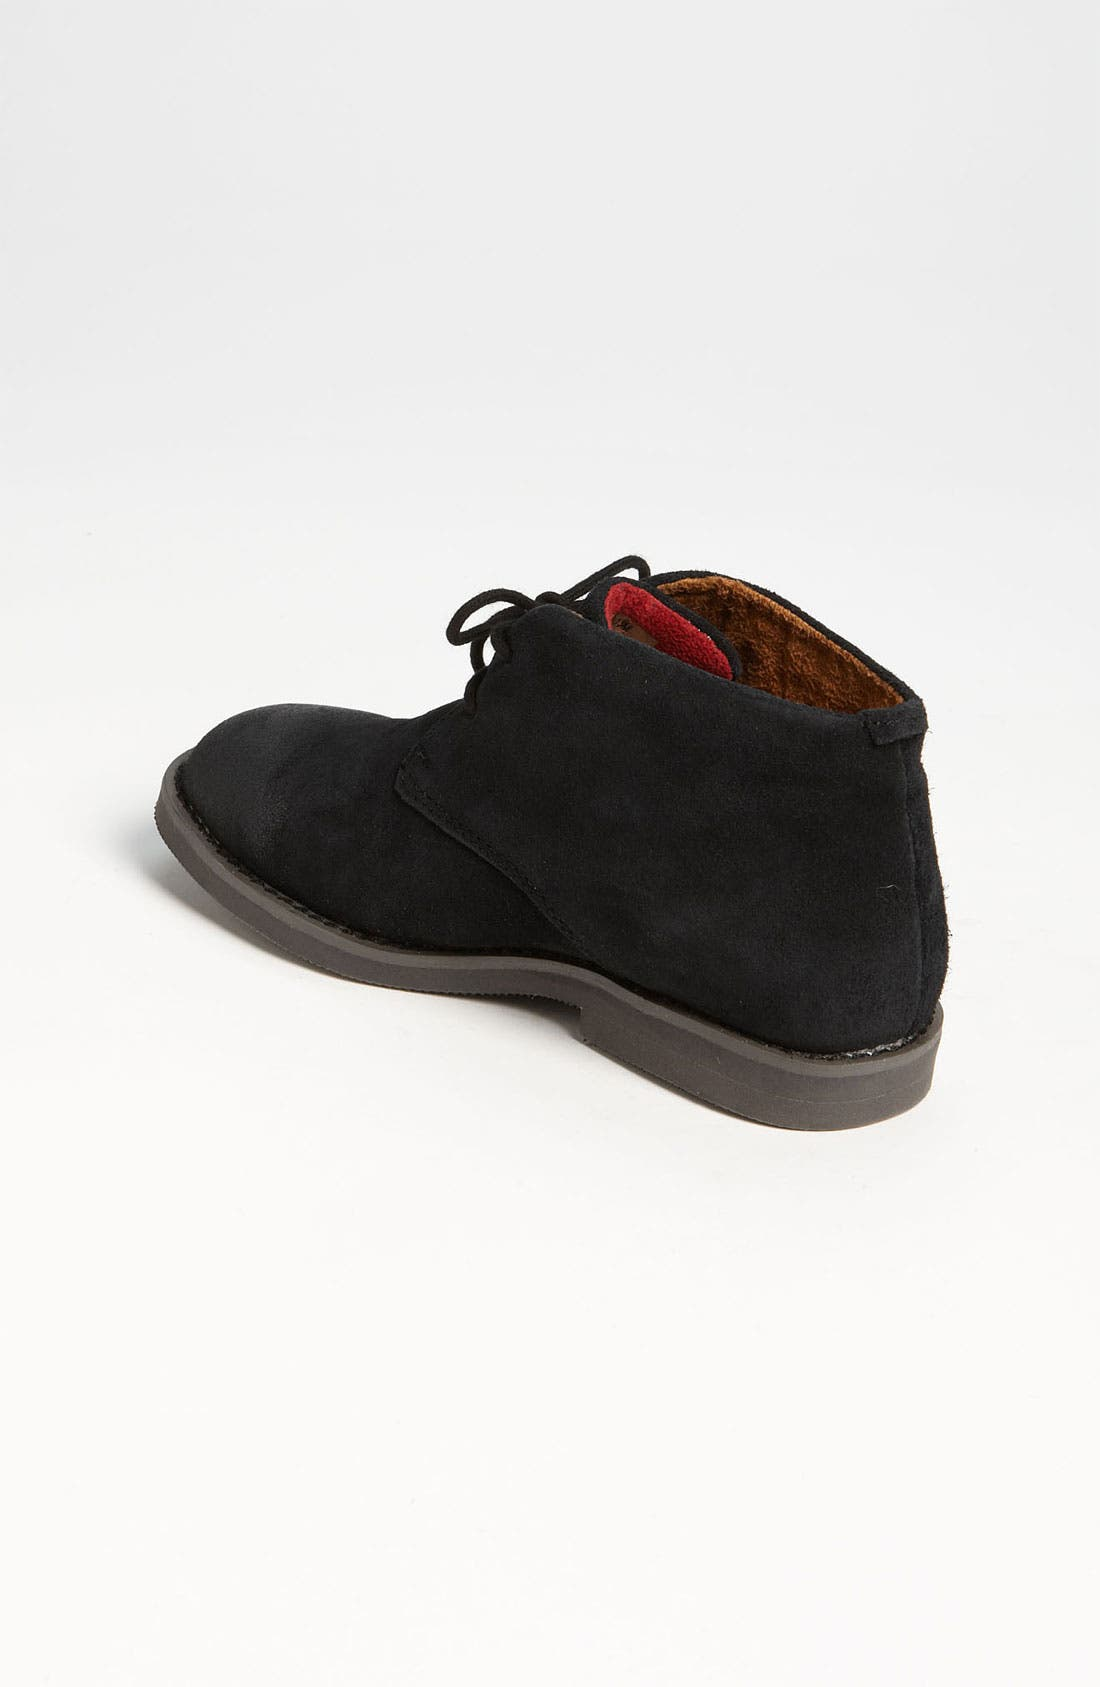 'Quinlan' Chukka Boot,                             Alternate thumbnail 8, color,                             001